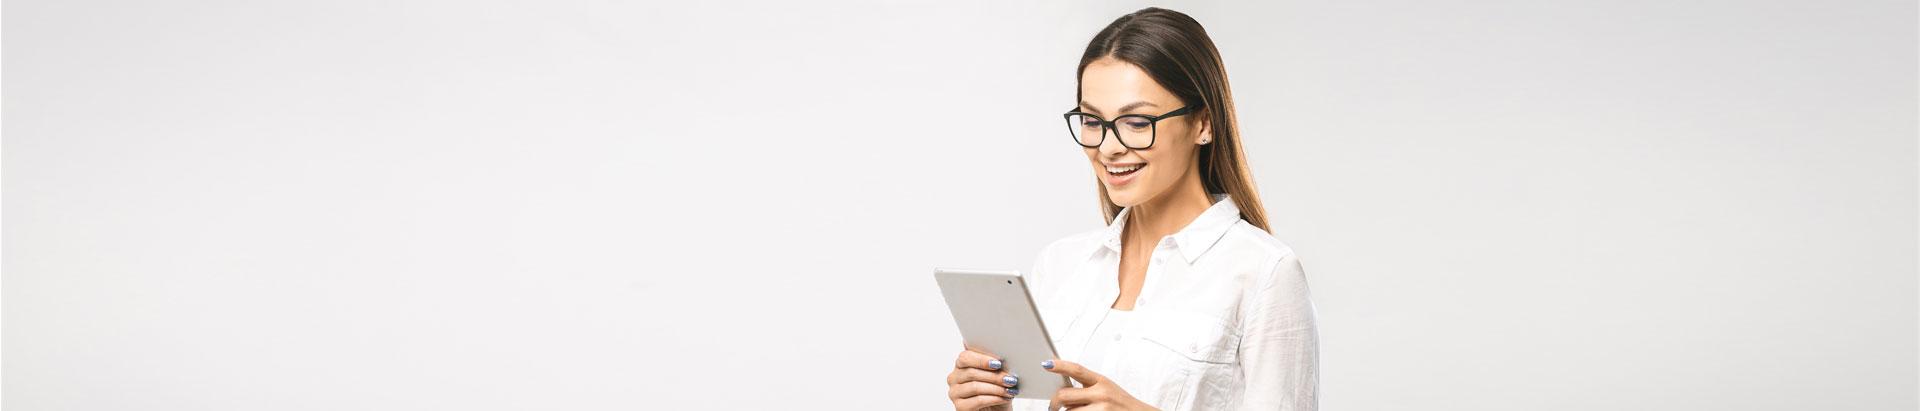 cabecera-psicologia-clinica-online